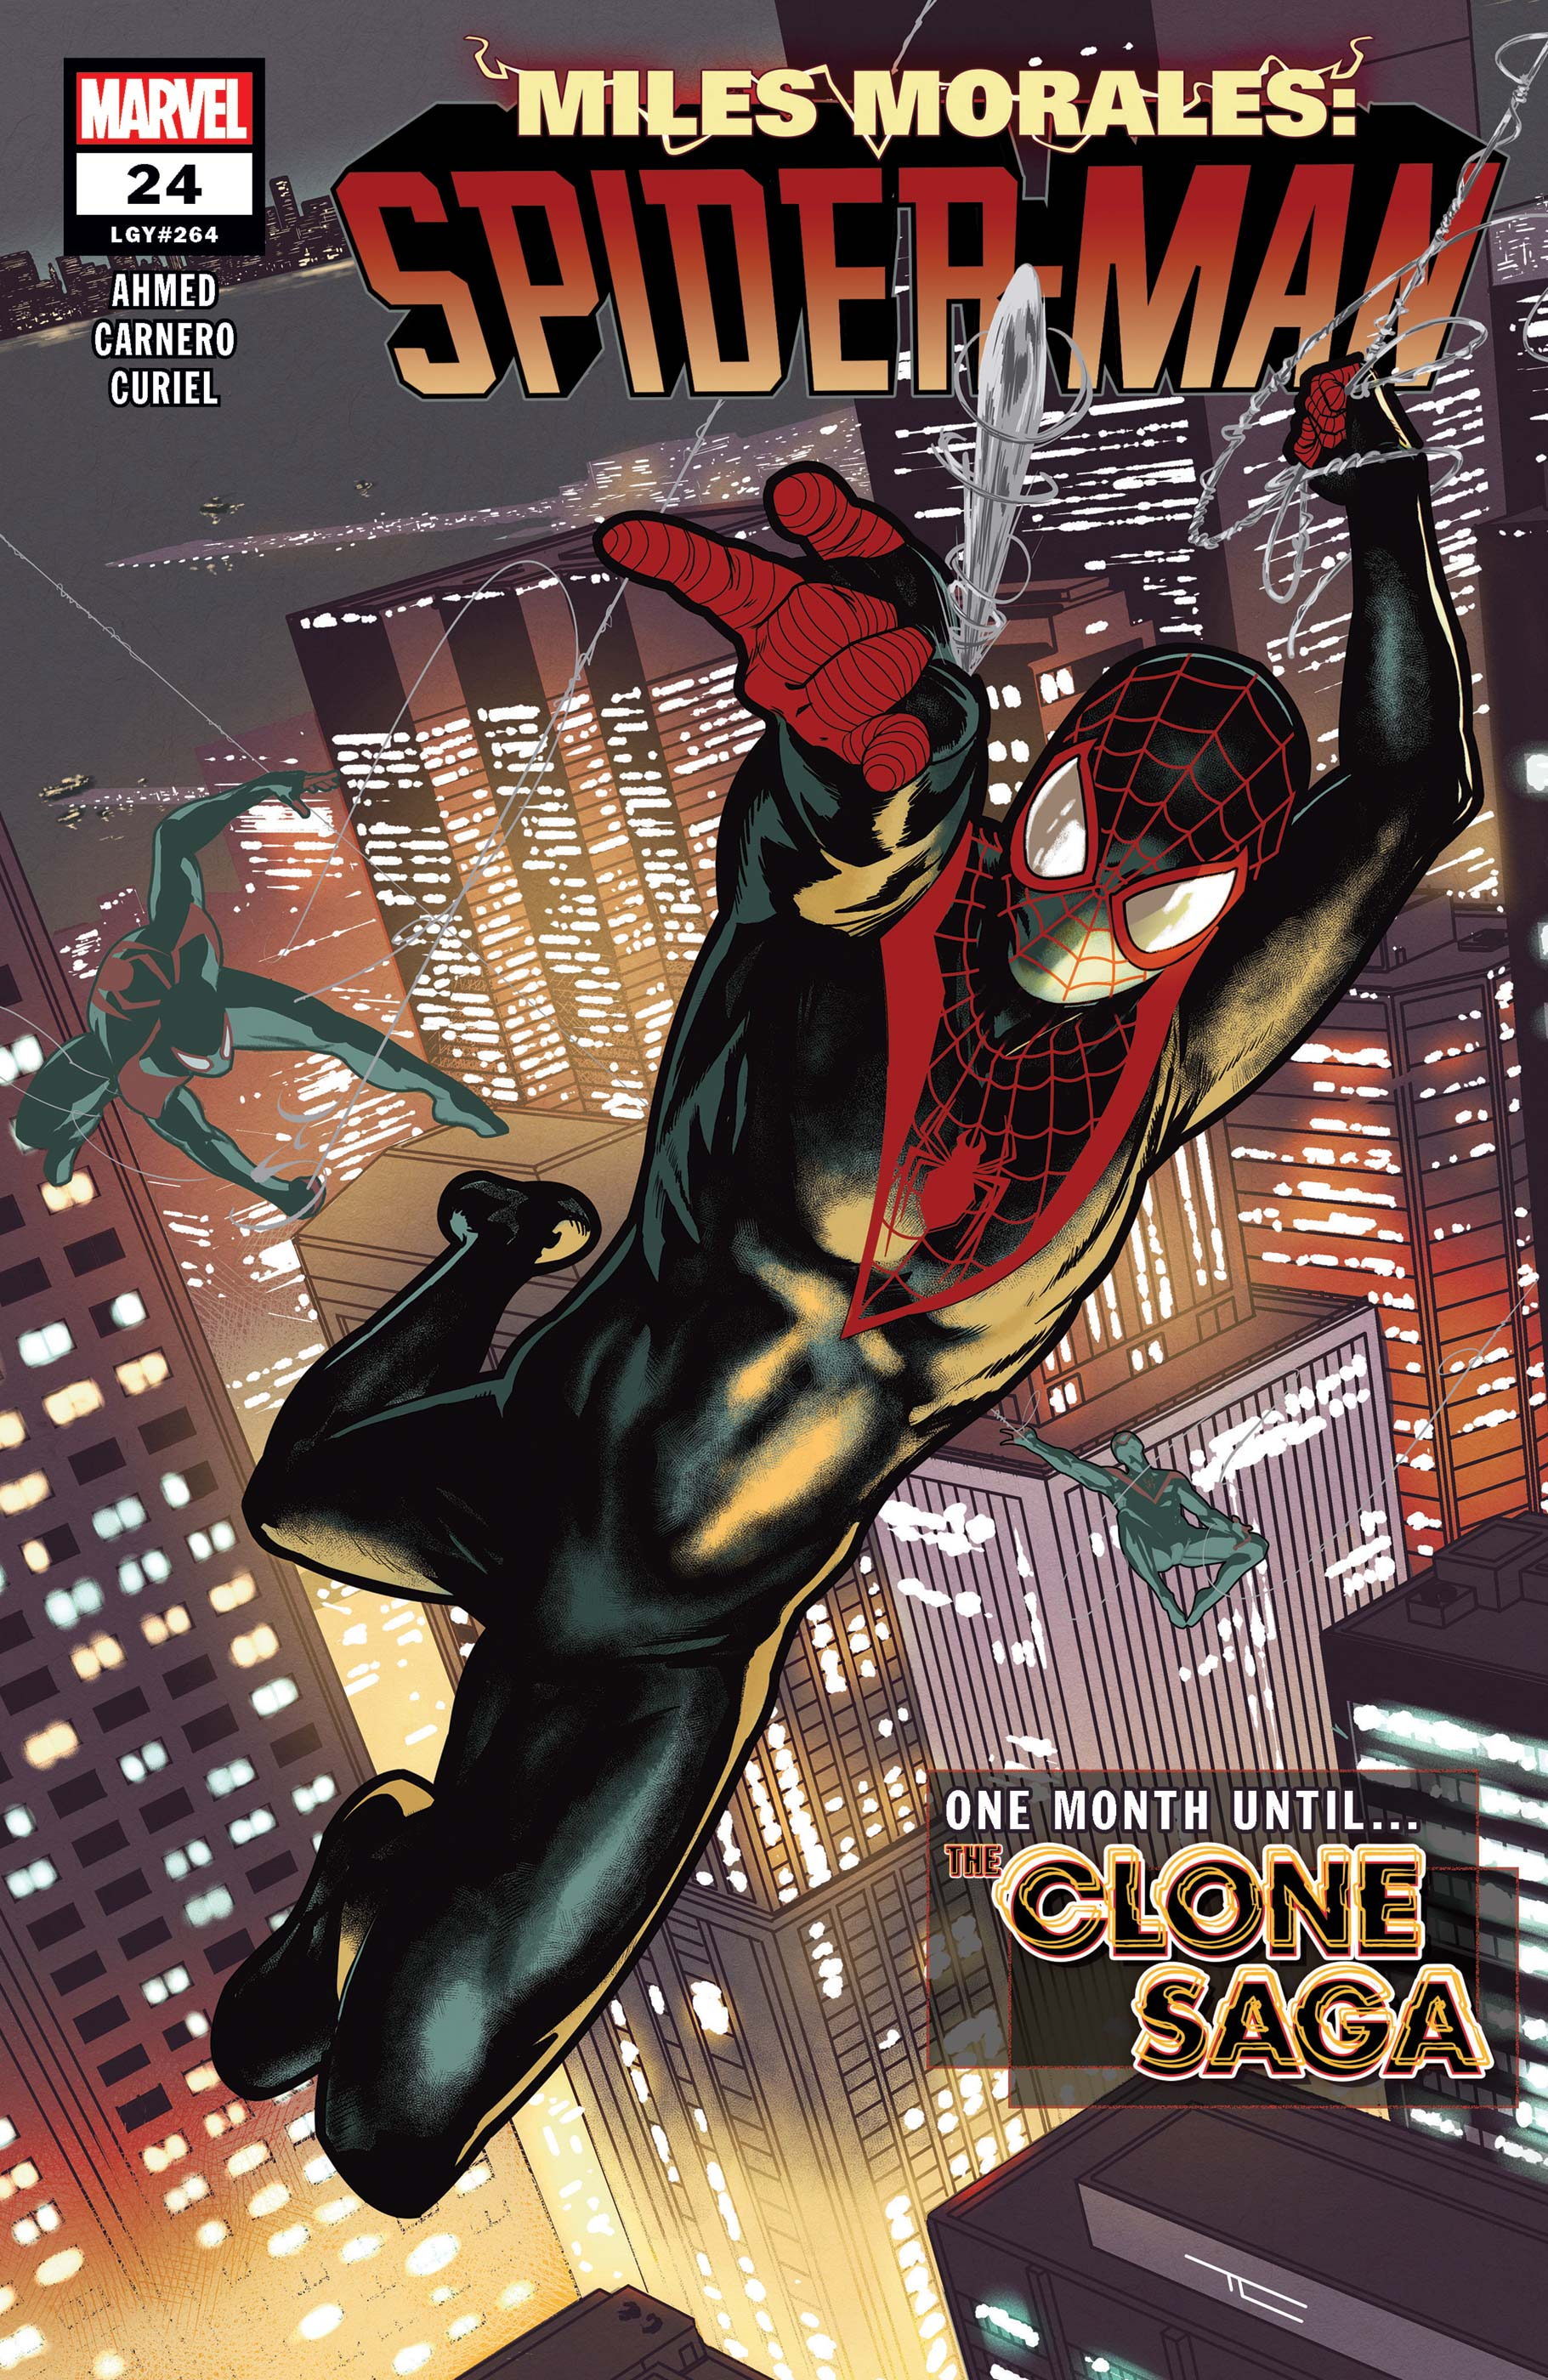 Miles Morales: Spider-Man (2018) #24